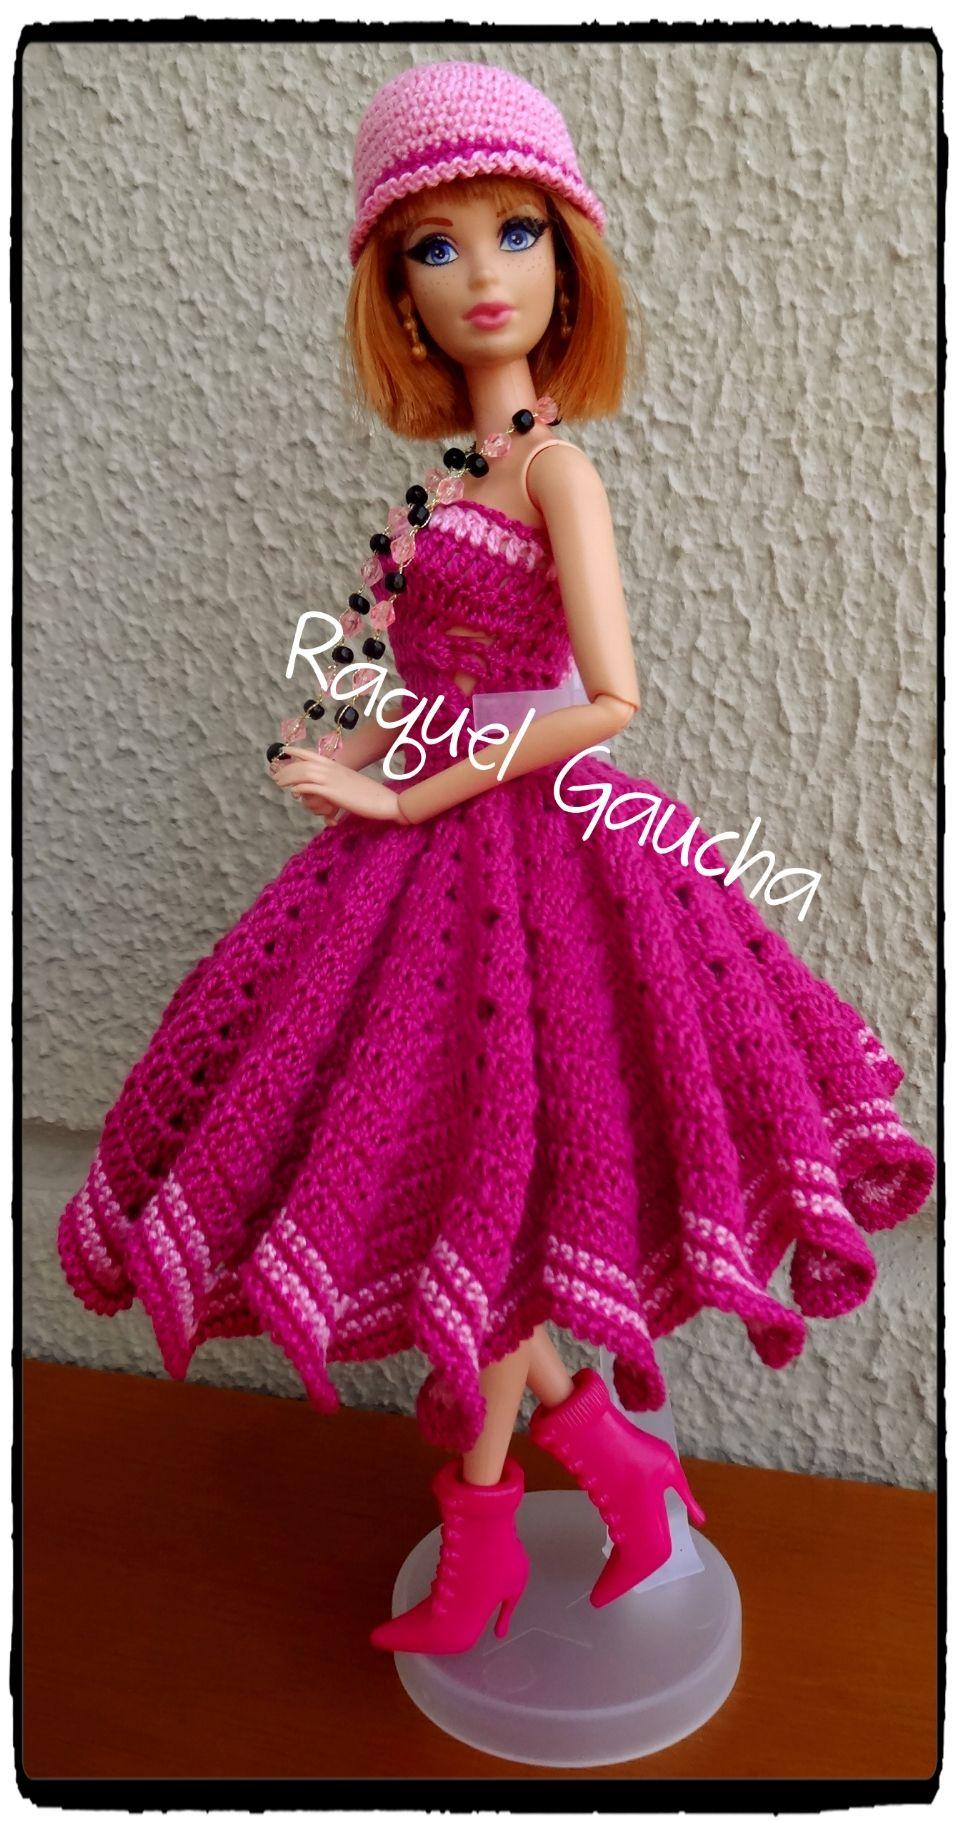 Cléa1000 #Crochet #Vestido #Dress #Chapéu, #Sombrero #Gorrito ...